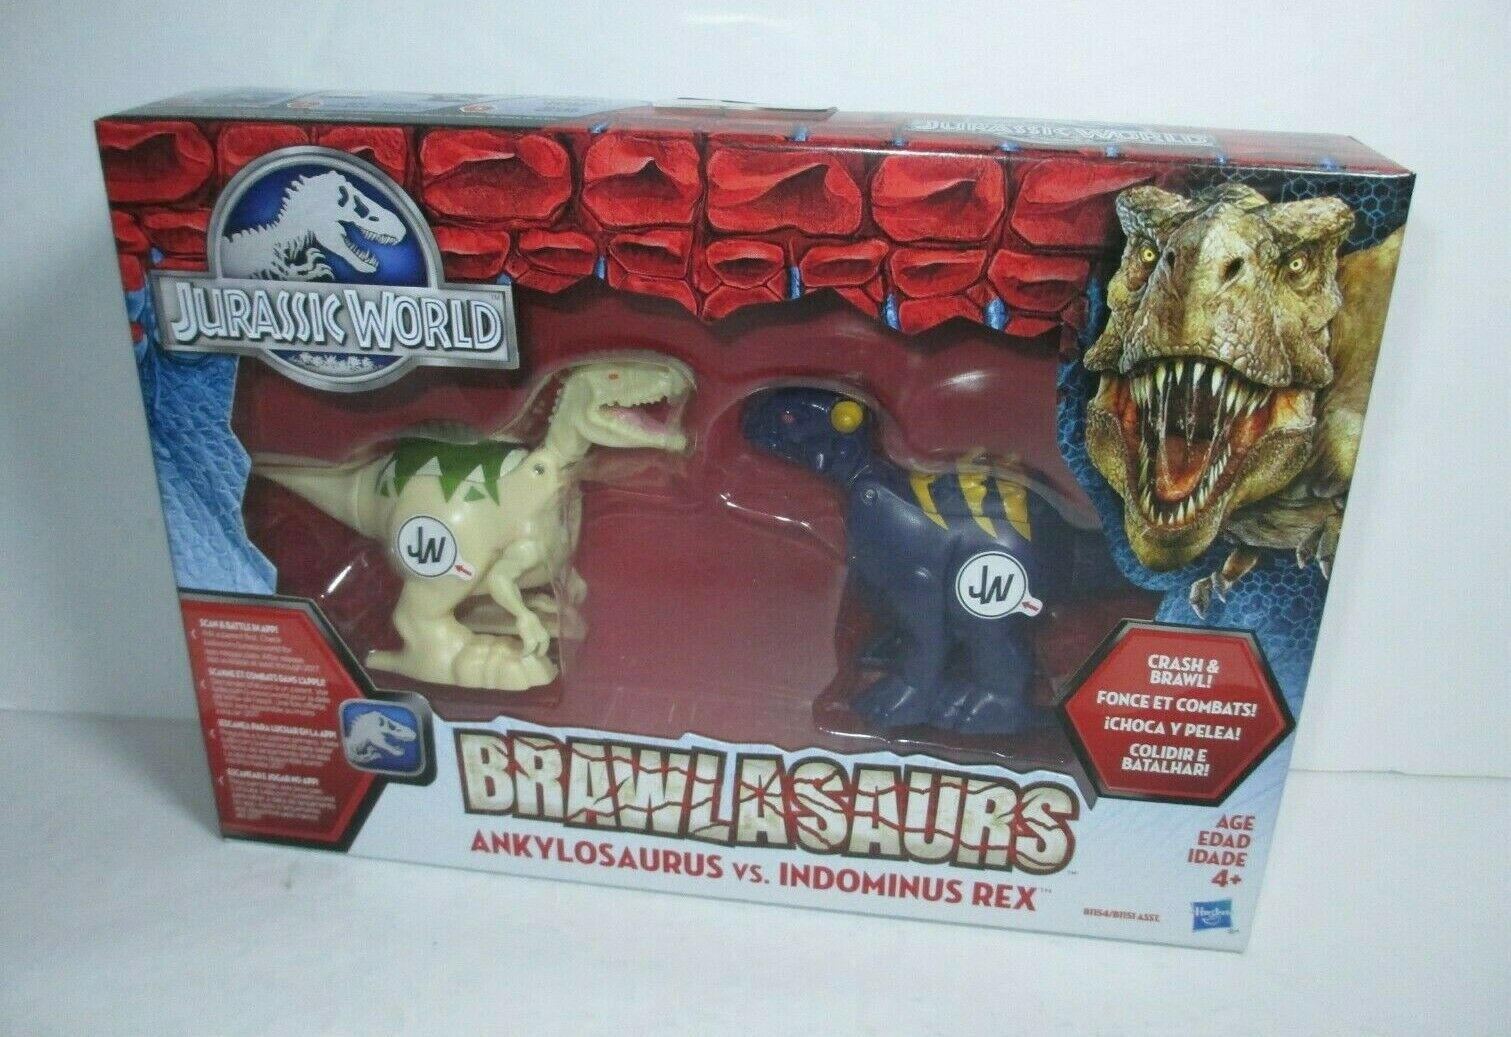 2015 Jurassic World Brawlasaurs MISB Ankylosaurus Indominus Rex Figure Pack